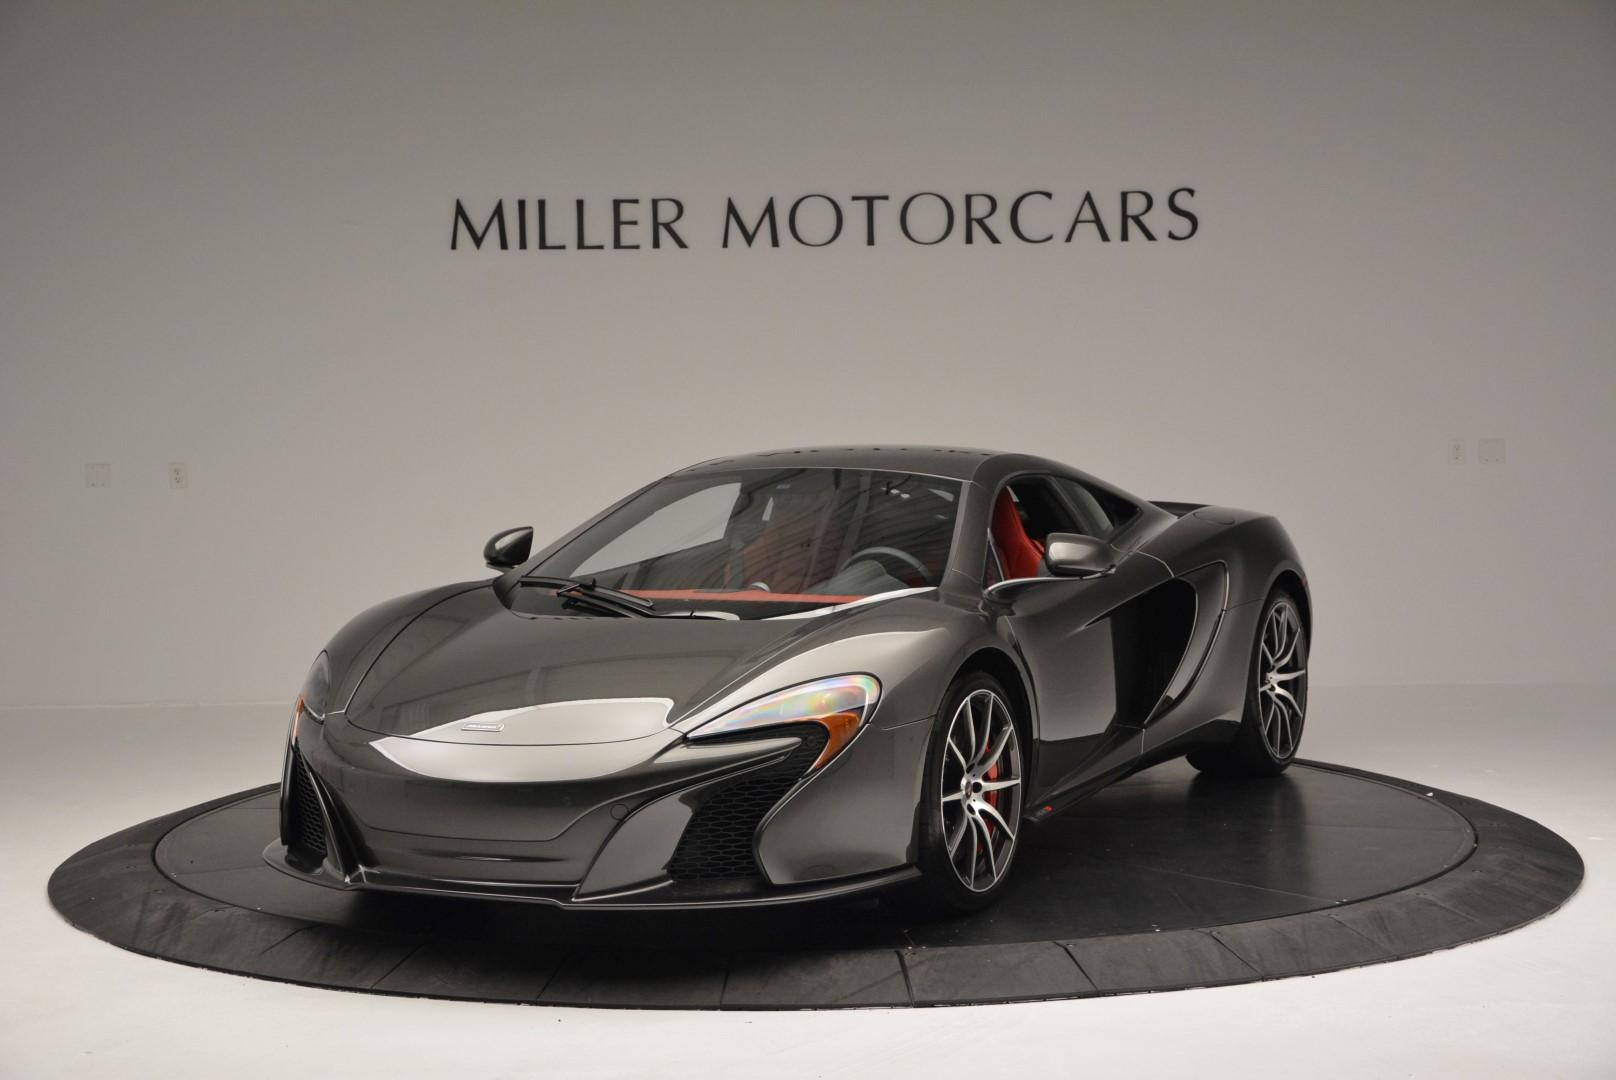 Used 2015 McLaren 650S  For Sale In Greenwich, CT. Alfa Romeo of Greenwich, 3076 71_main